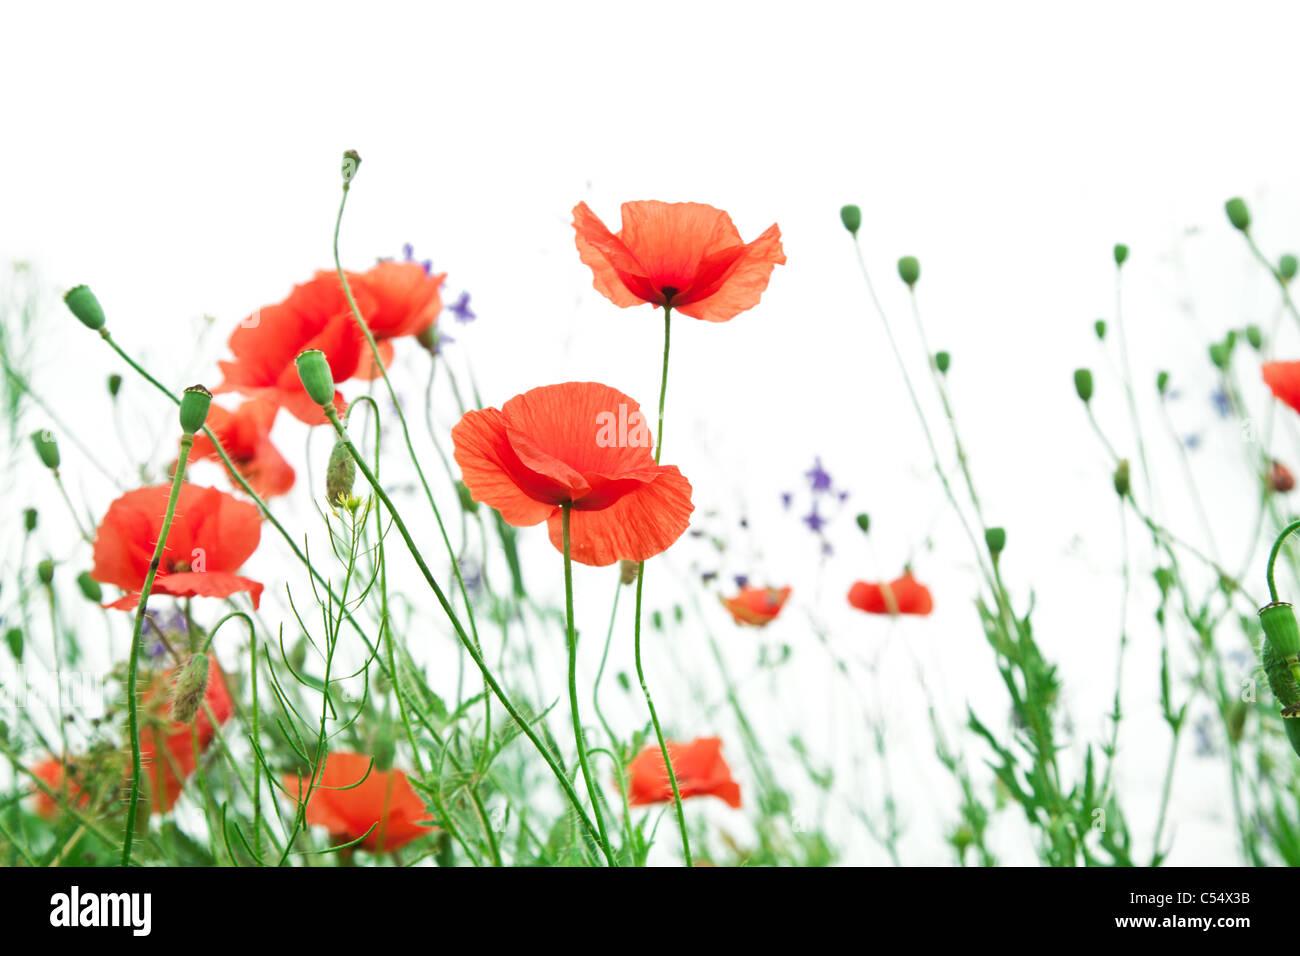 Tender poppy flowers on a white background. Stock Photo